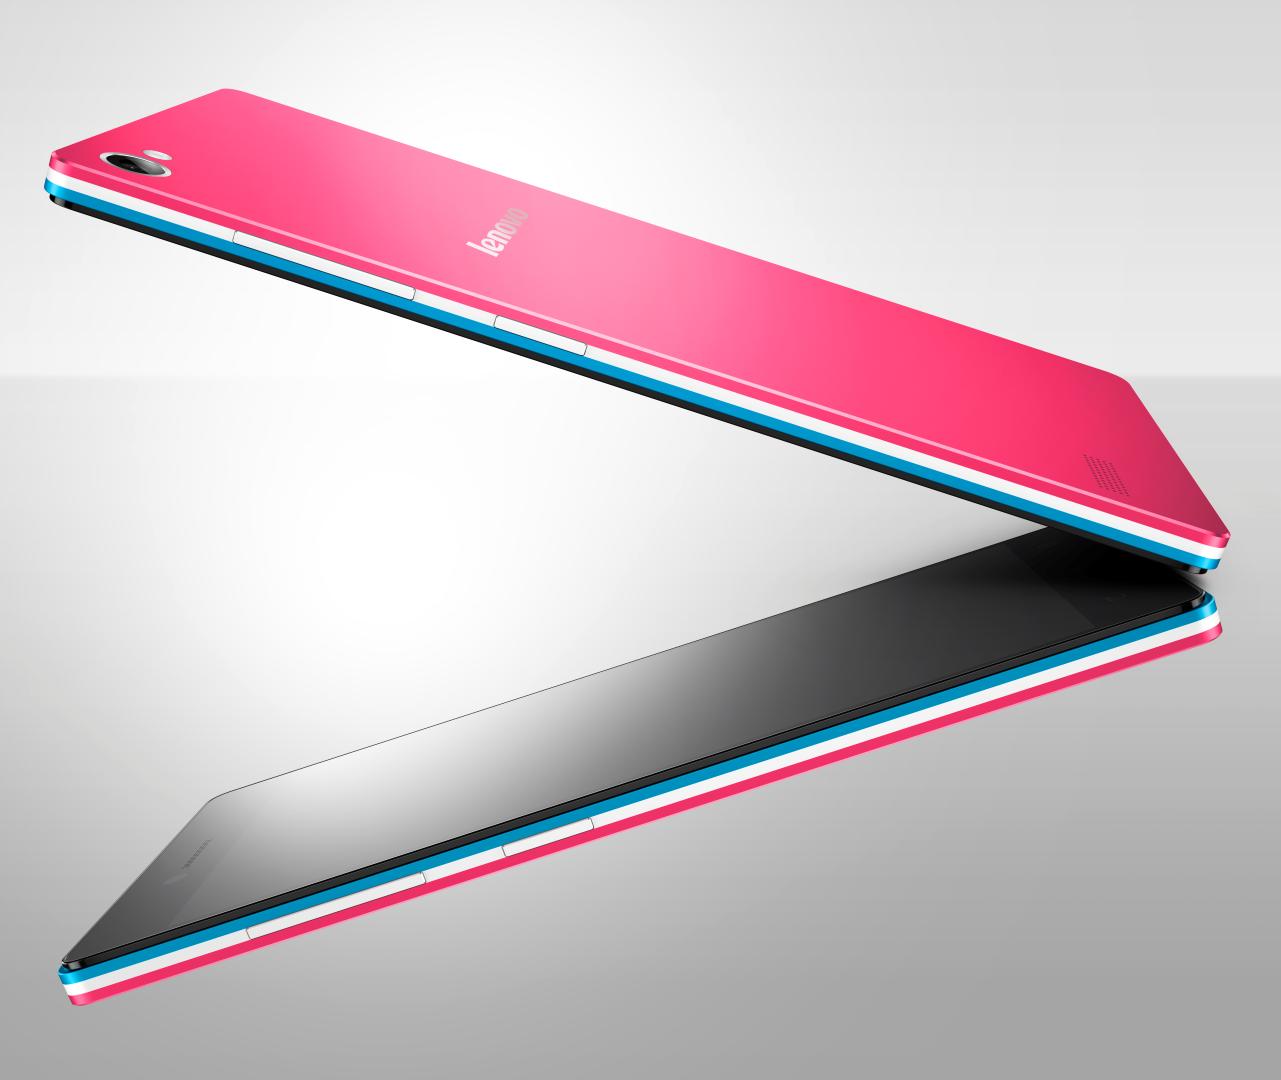 VIBE X2 en color rosa